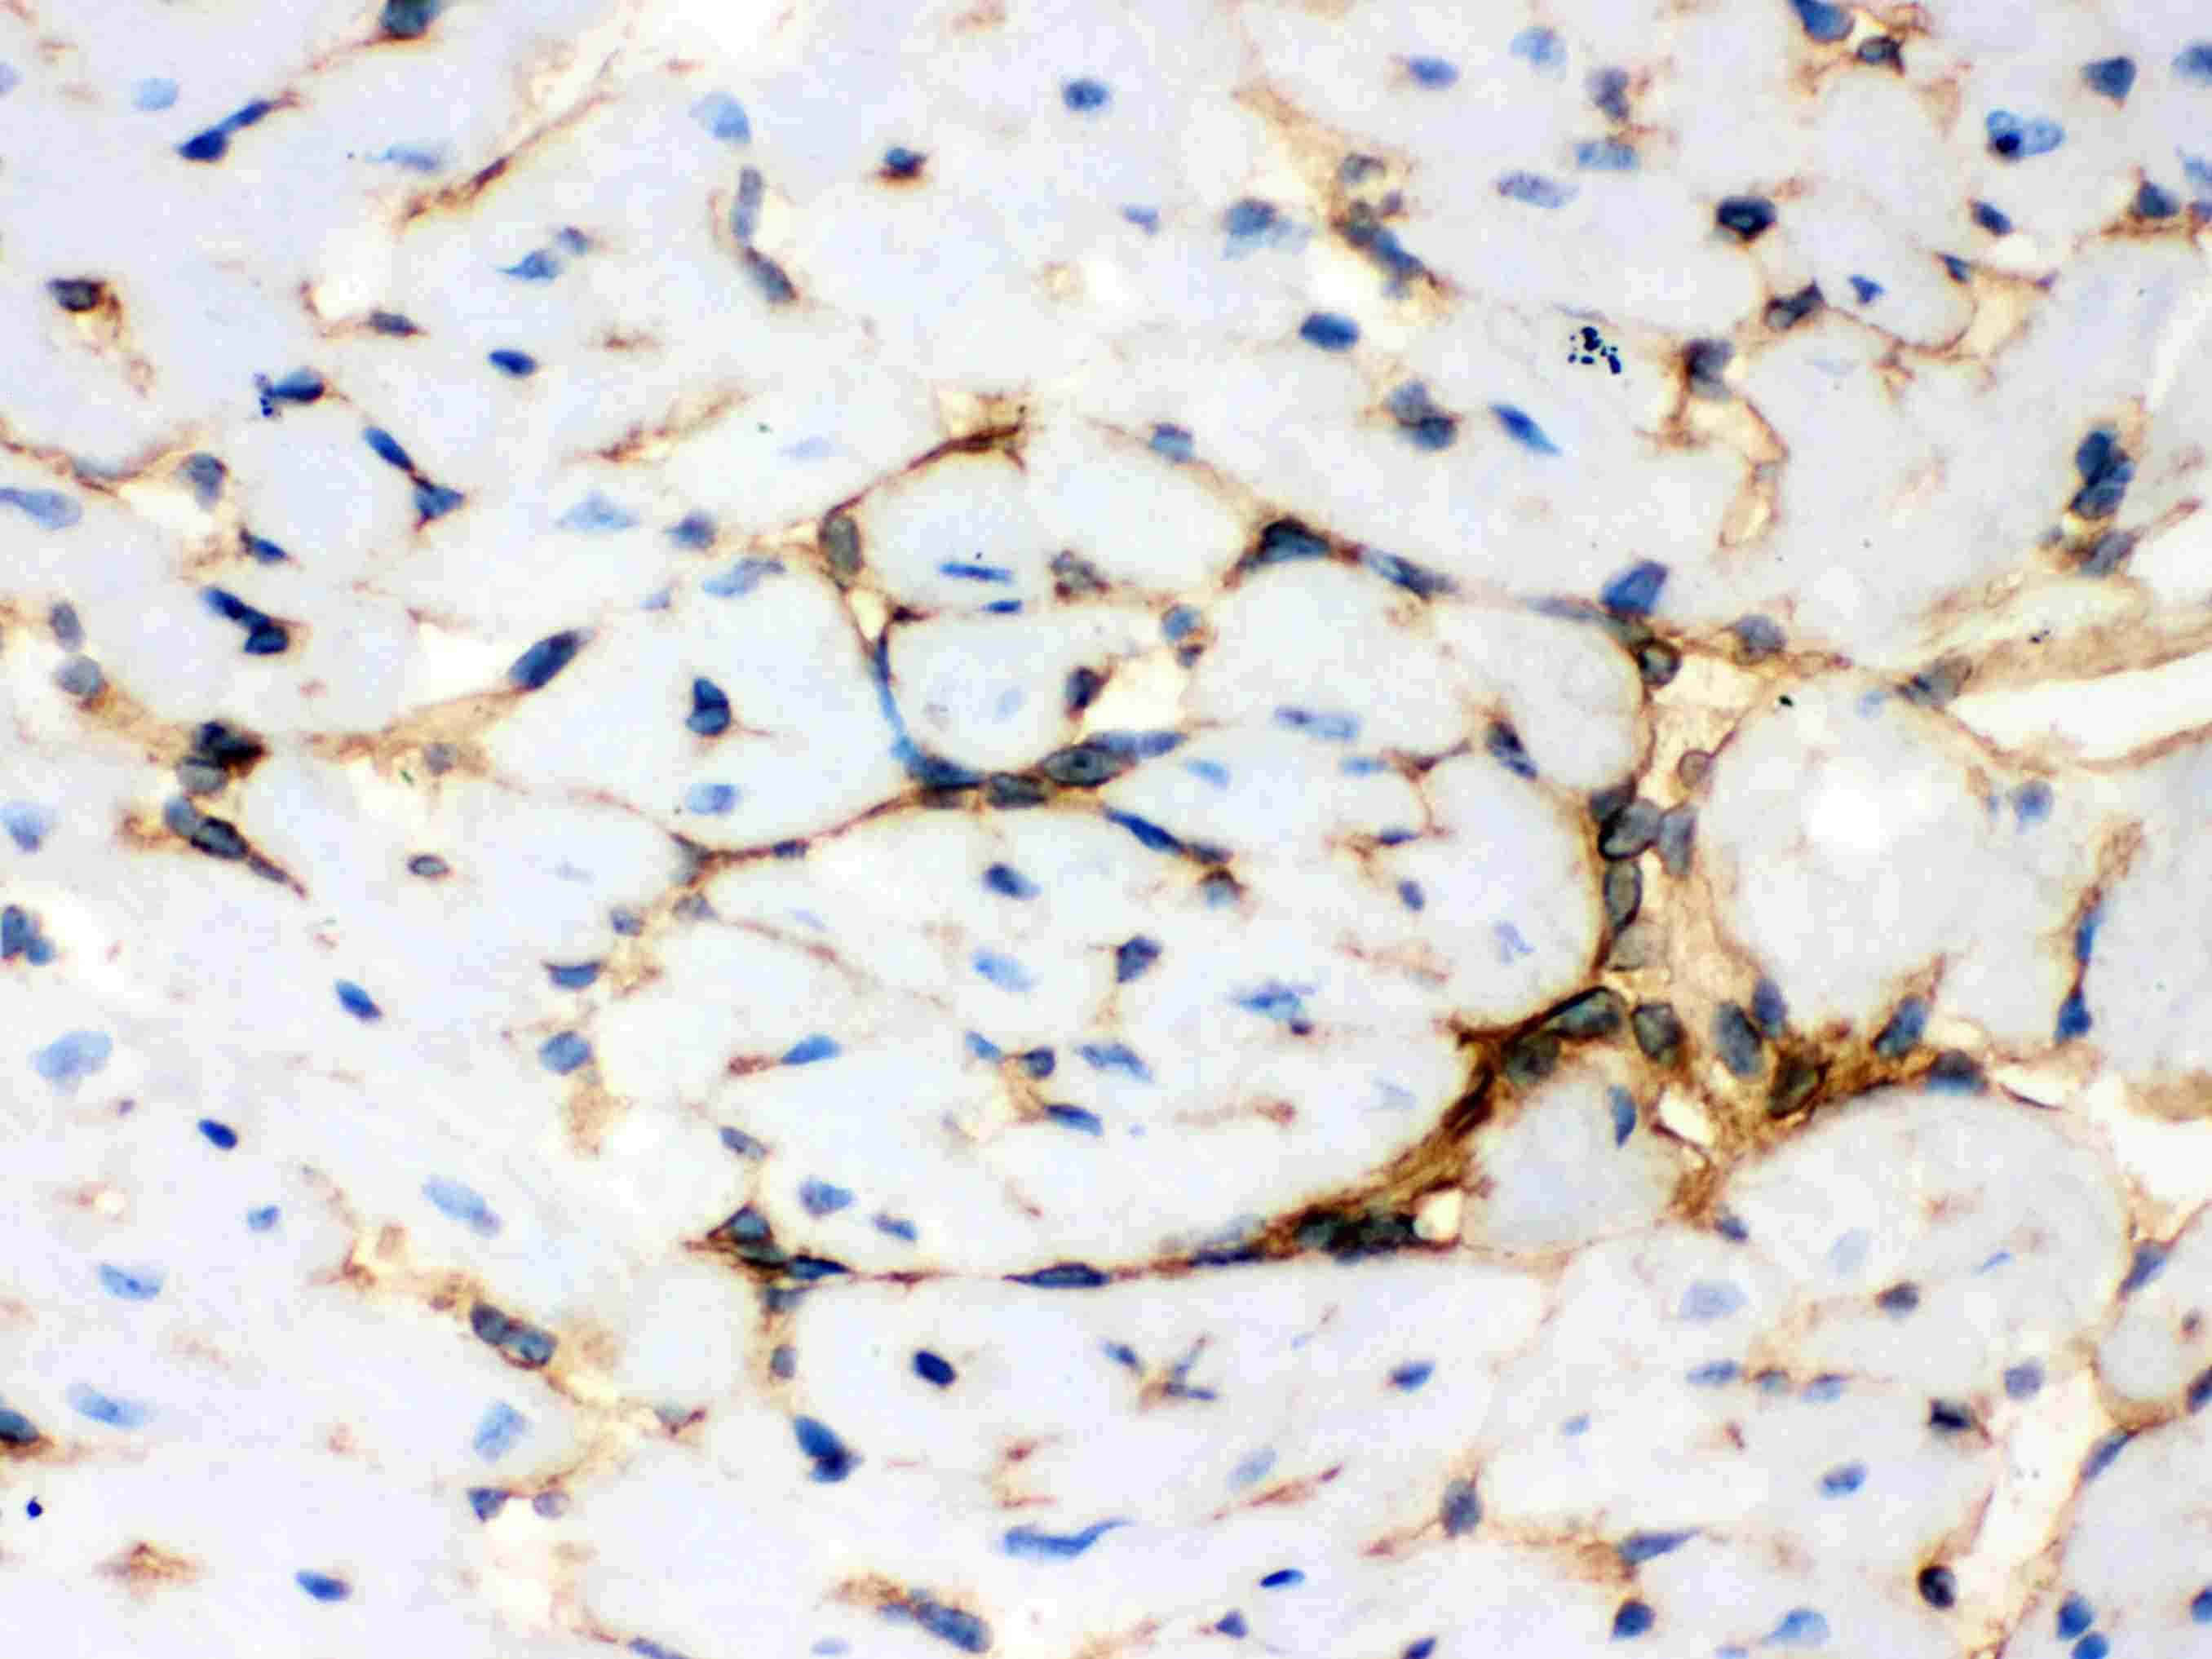 Annexin A3 Antibody in Immunohistochemistry (IHC)